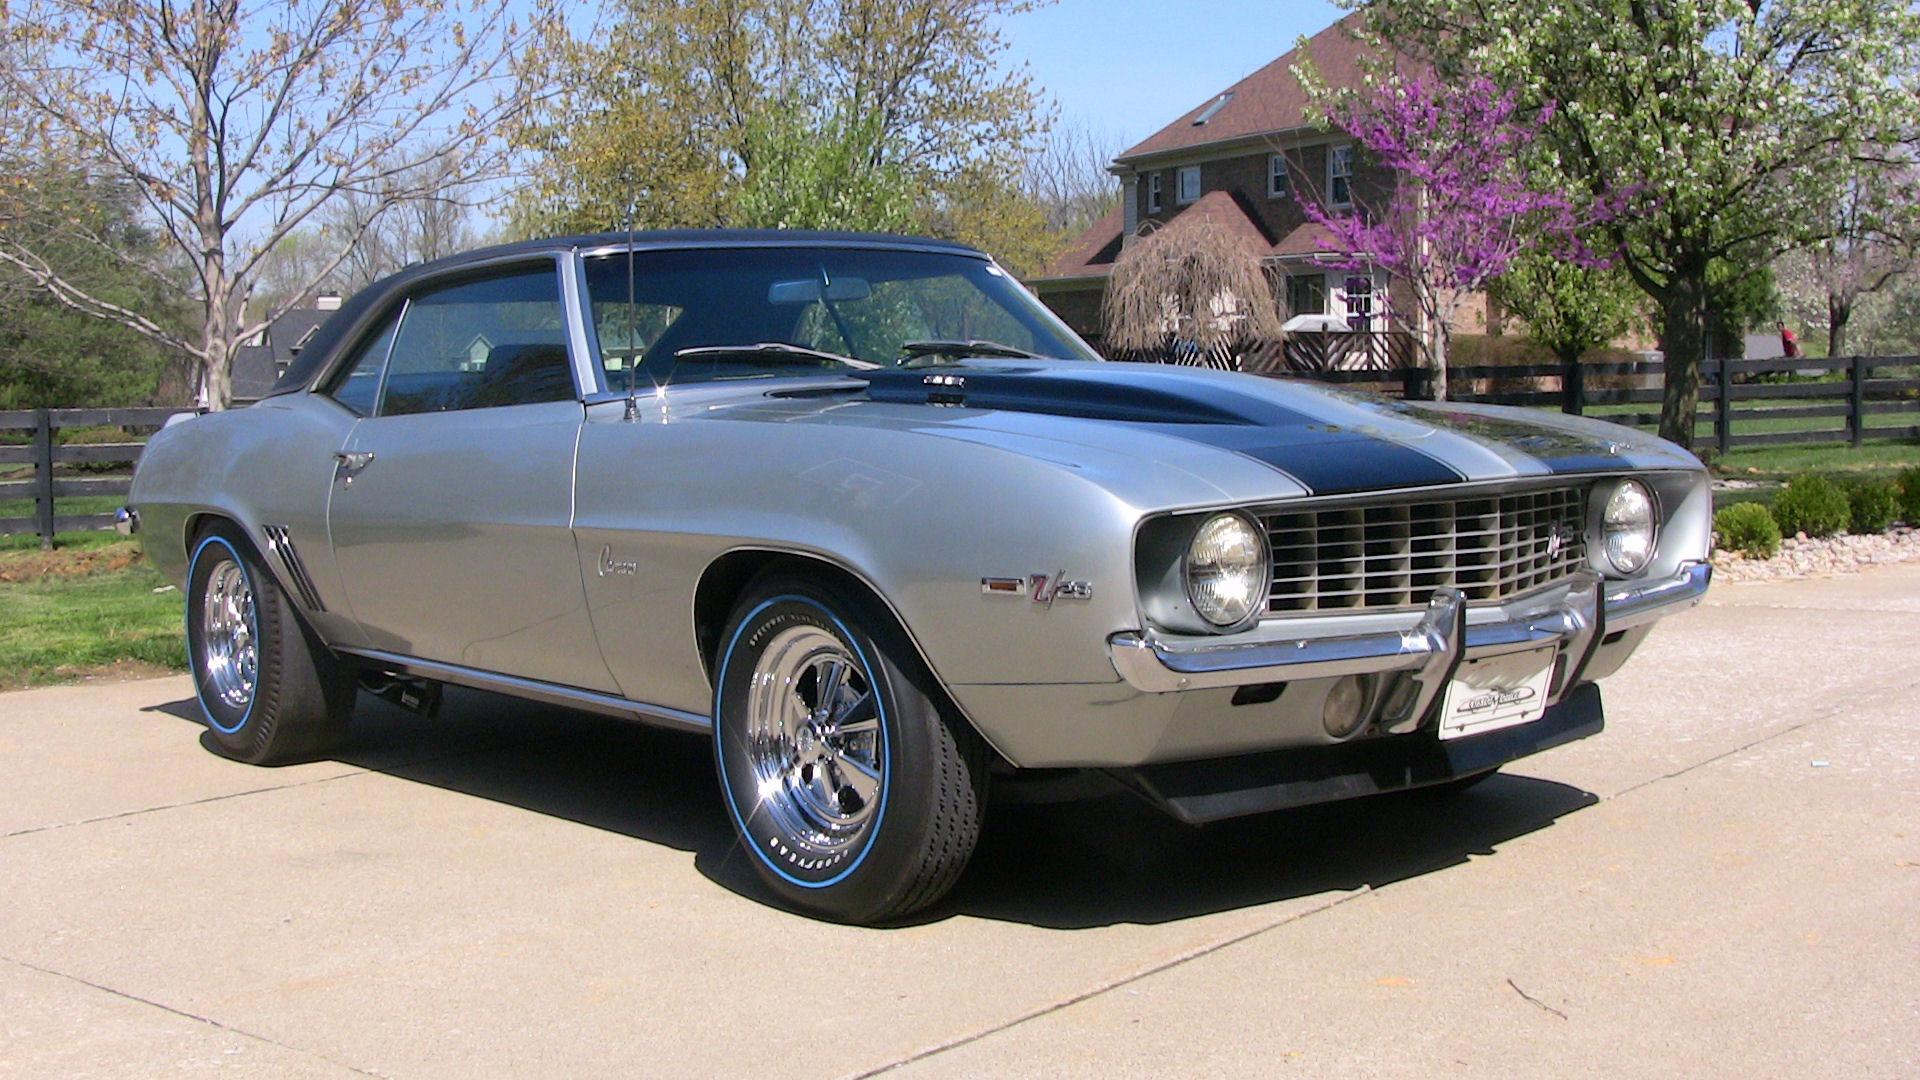 1969 Chevrolet Camaro Z28 Stock # A183 for sale near Cornelius, NC ...